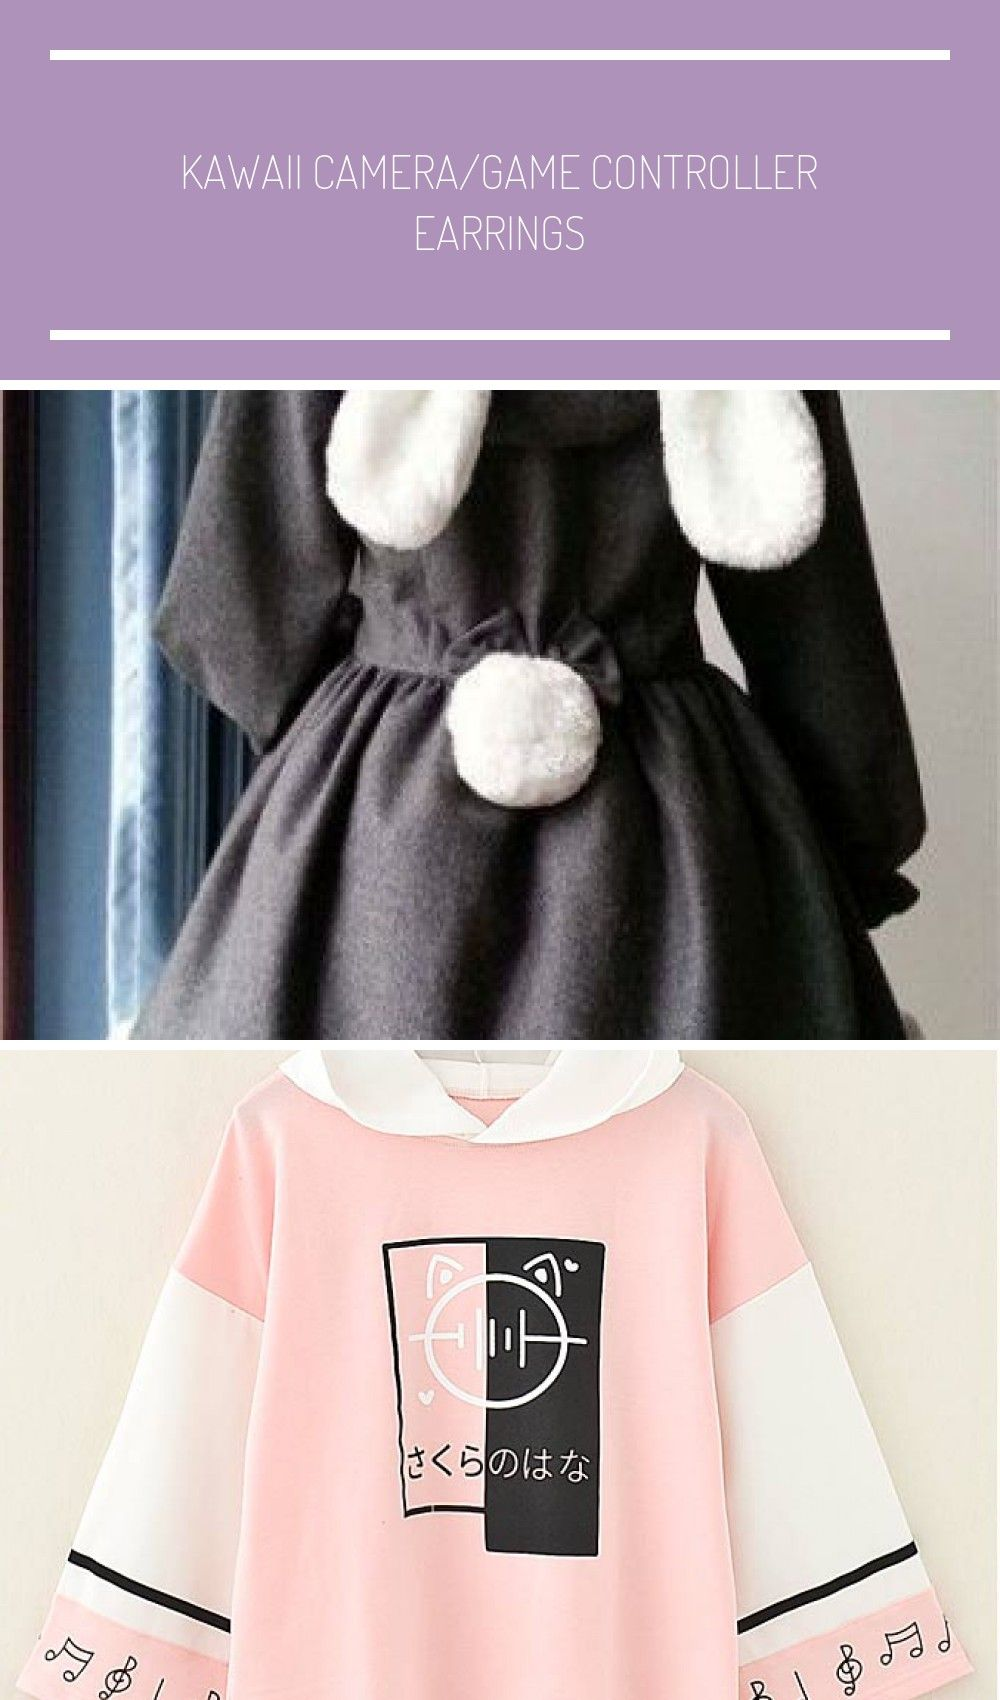 55+ New Ideas for diy clothes goth kawaii clothes 55+ New Ideas for diy clothes goth kawaii